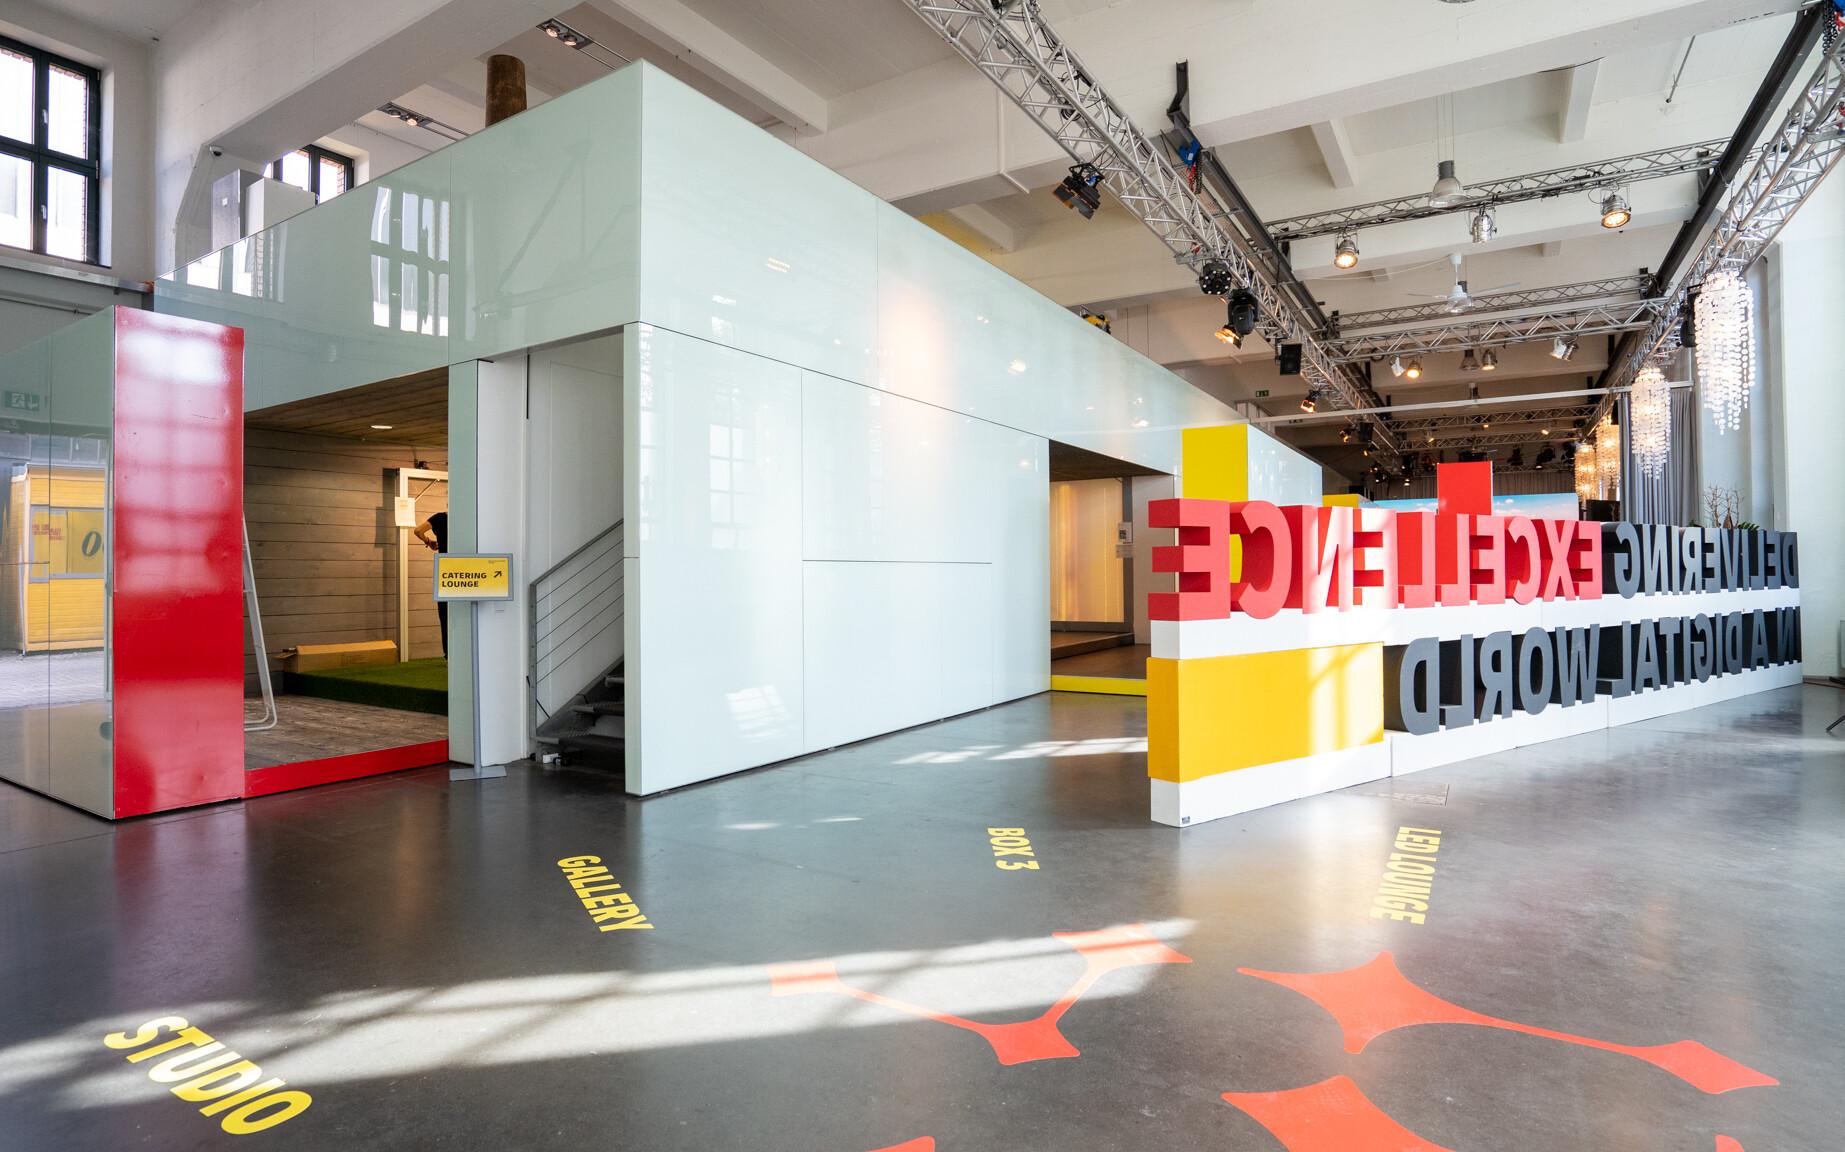 Digitales Event im Bauwerk Köln